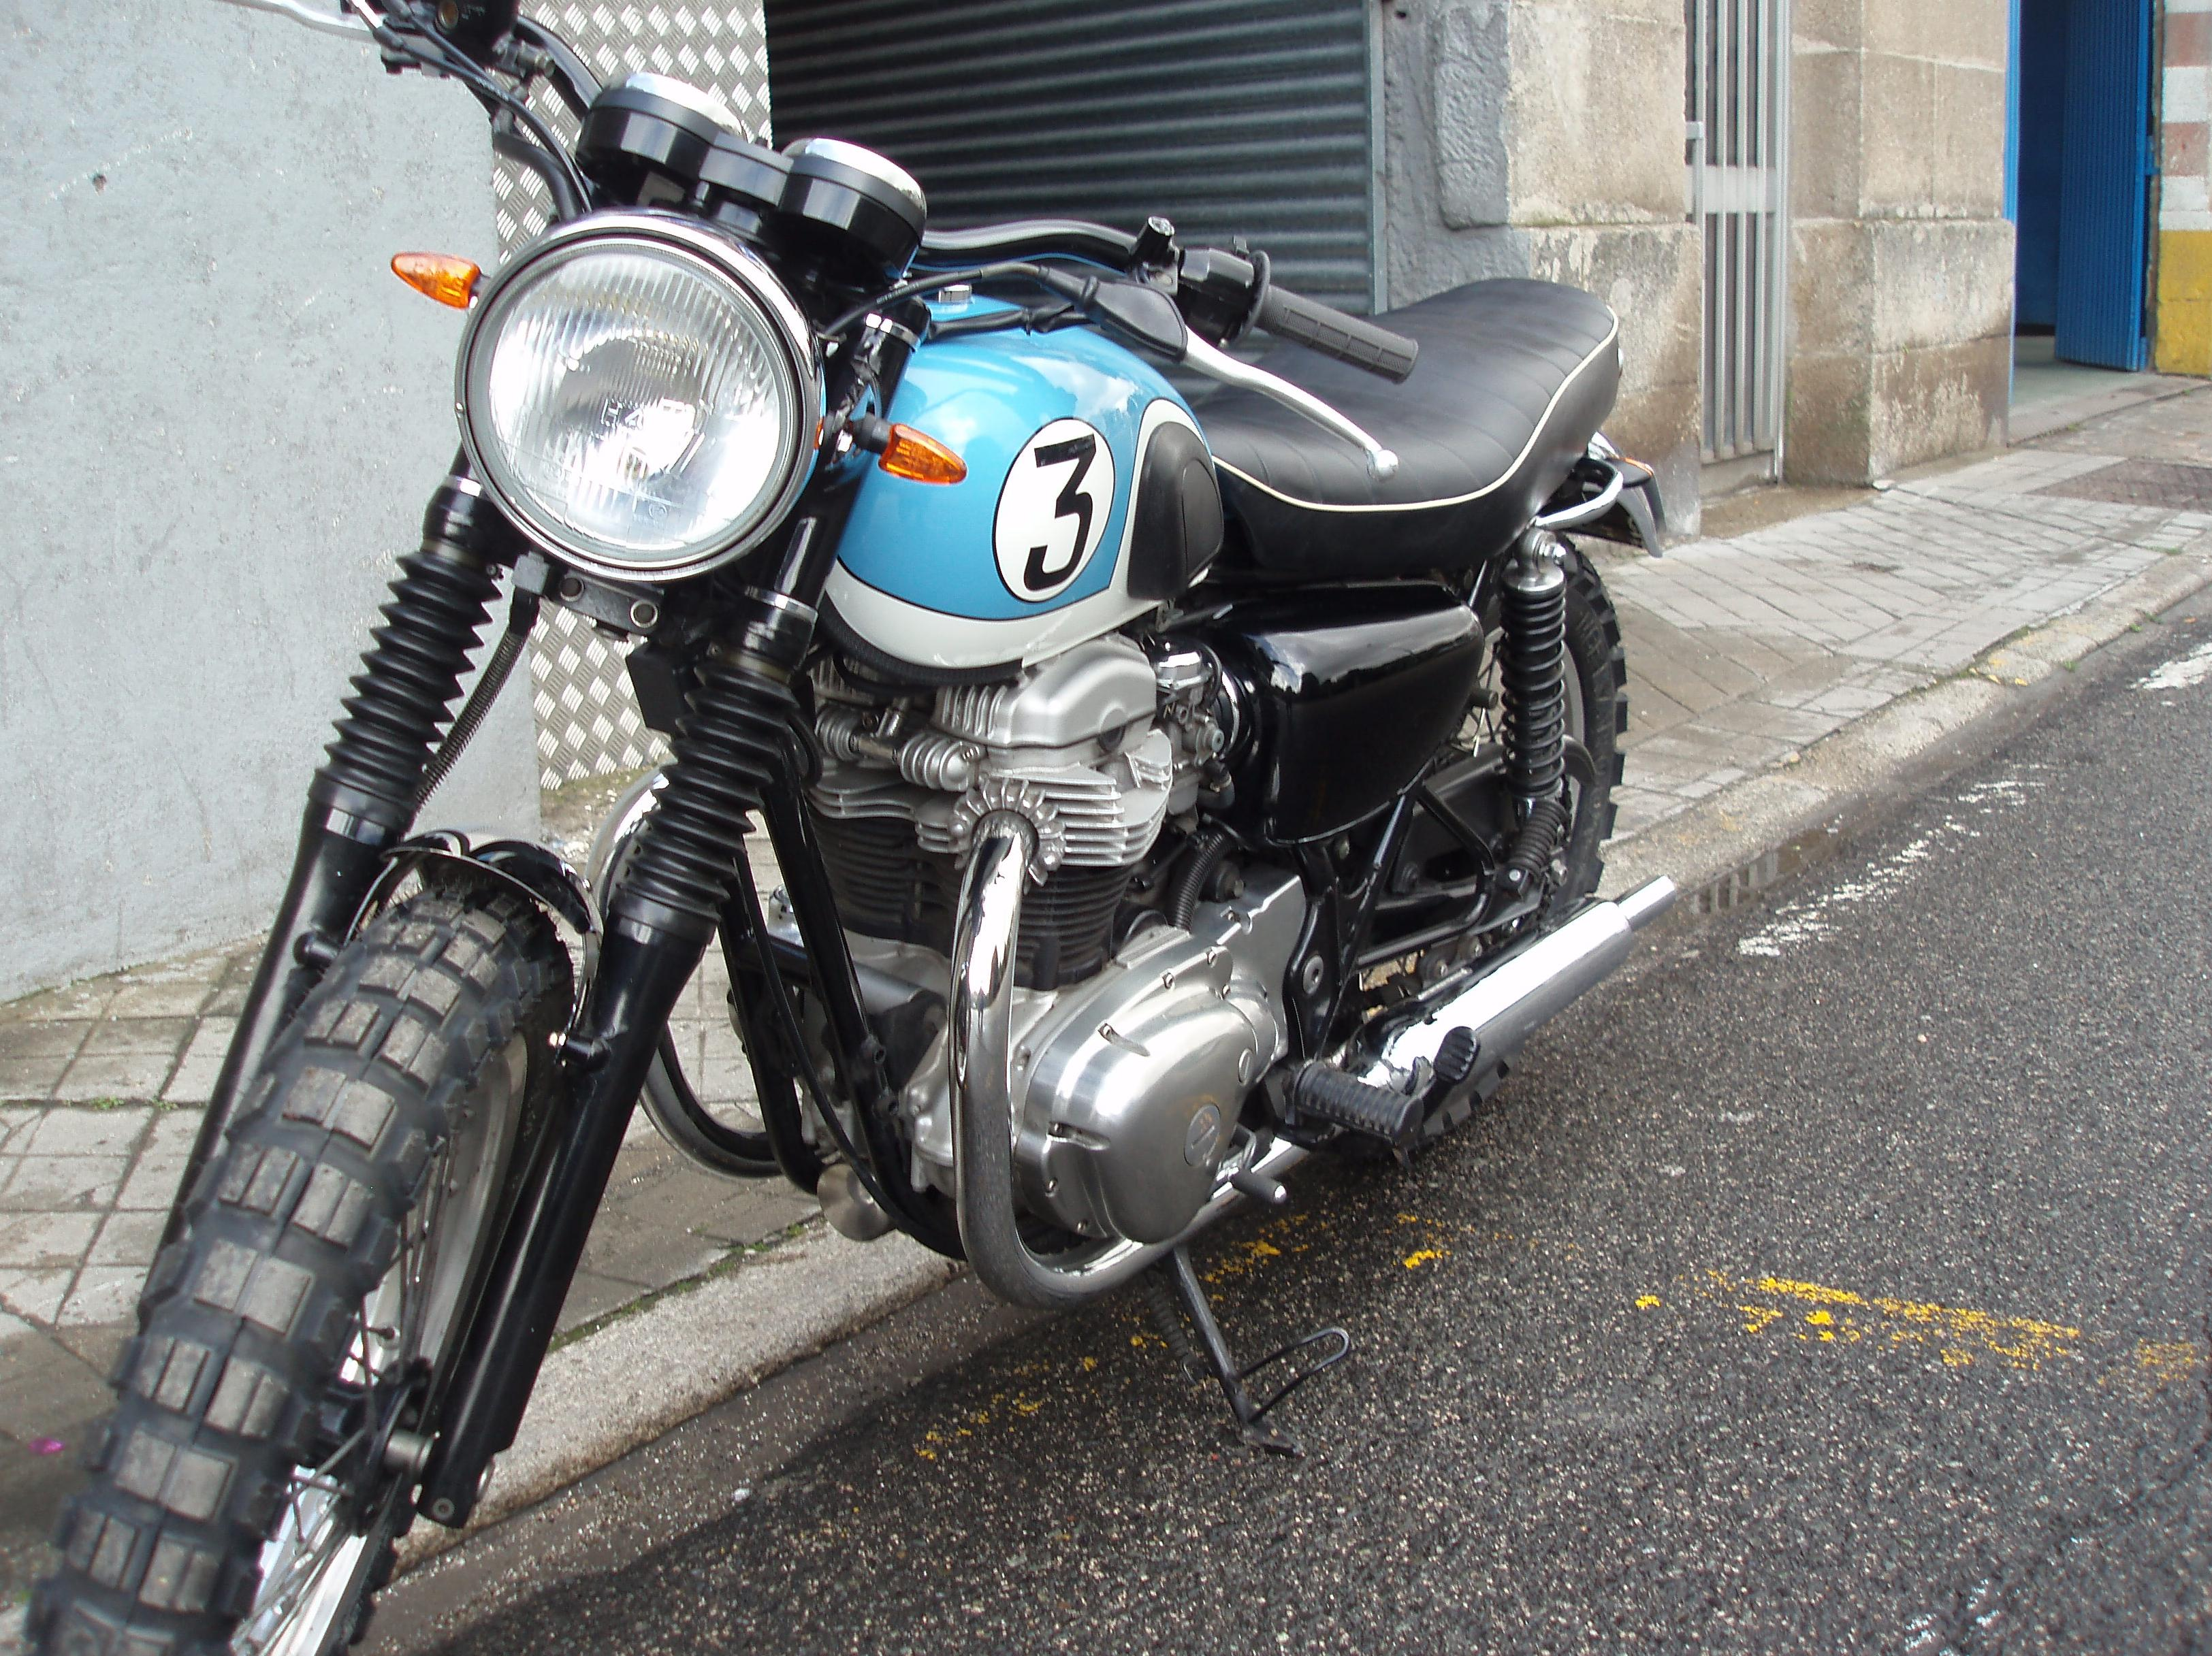 Foto 31 de Motos en Vigo | Moto 2